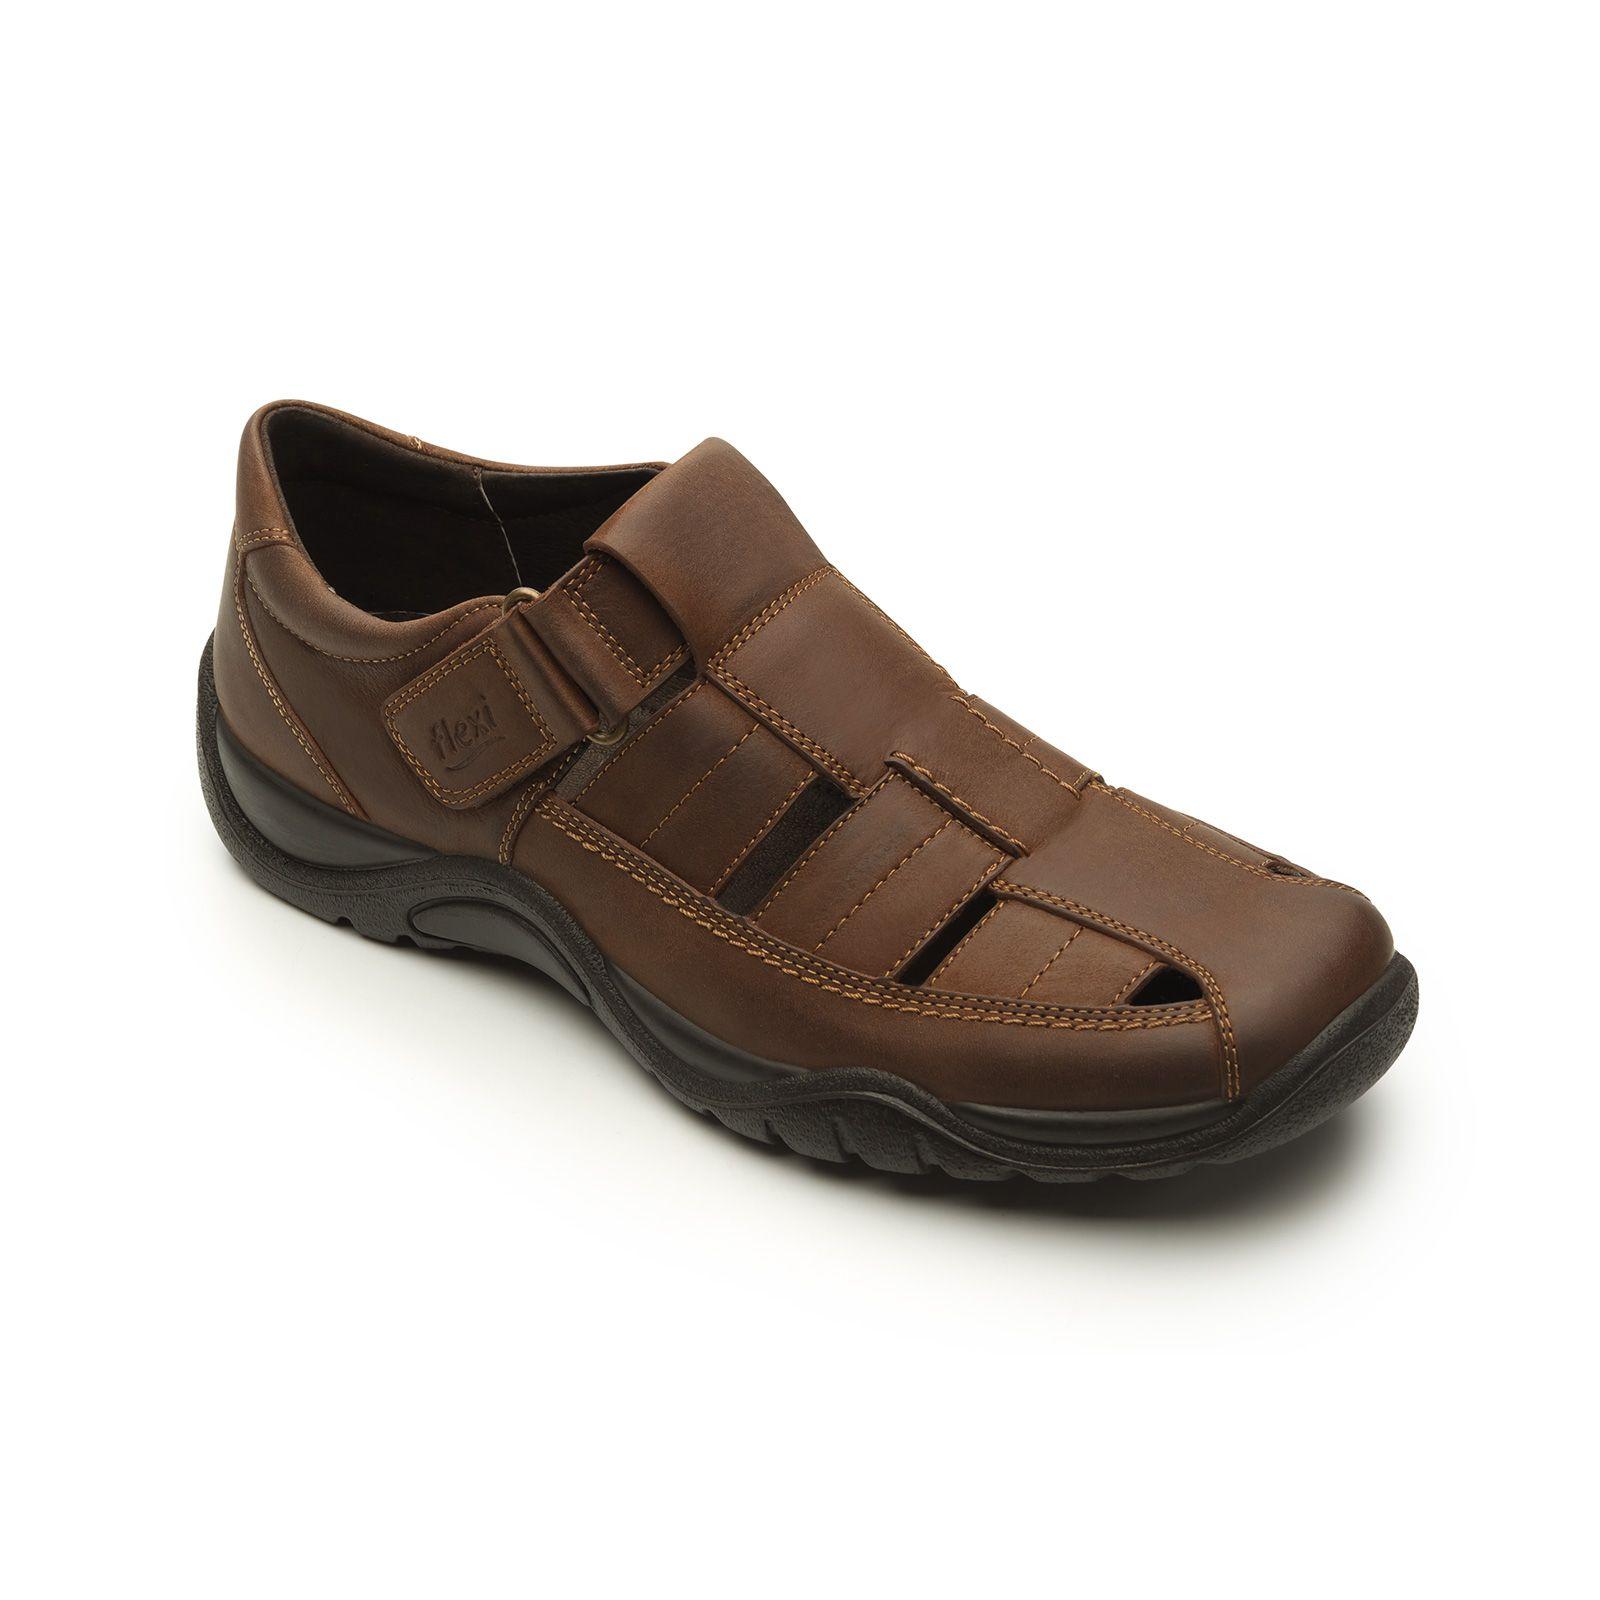 Coup De Pied Chaussures Plates Homme Dentelle Chaussures, Brun, Taille Eu 40